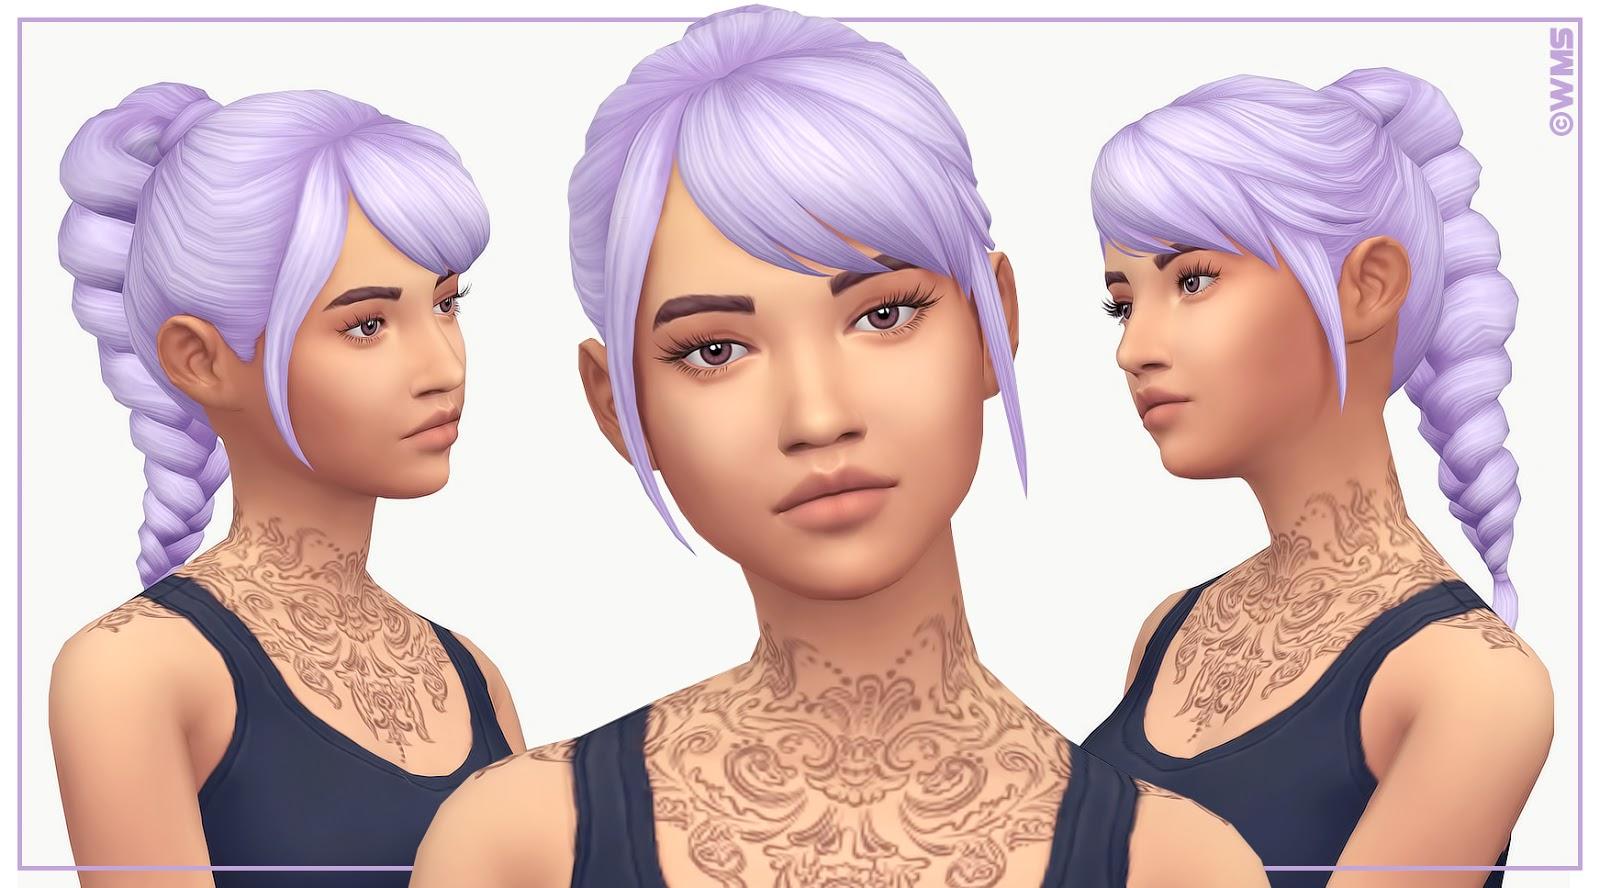 WildlyMiniatureSandwich | Maxis match, Sims 4, Sims